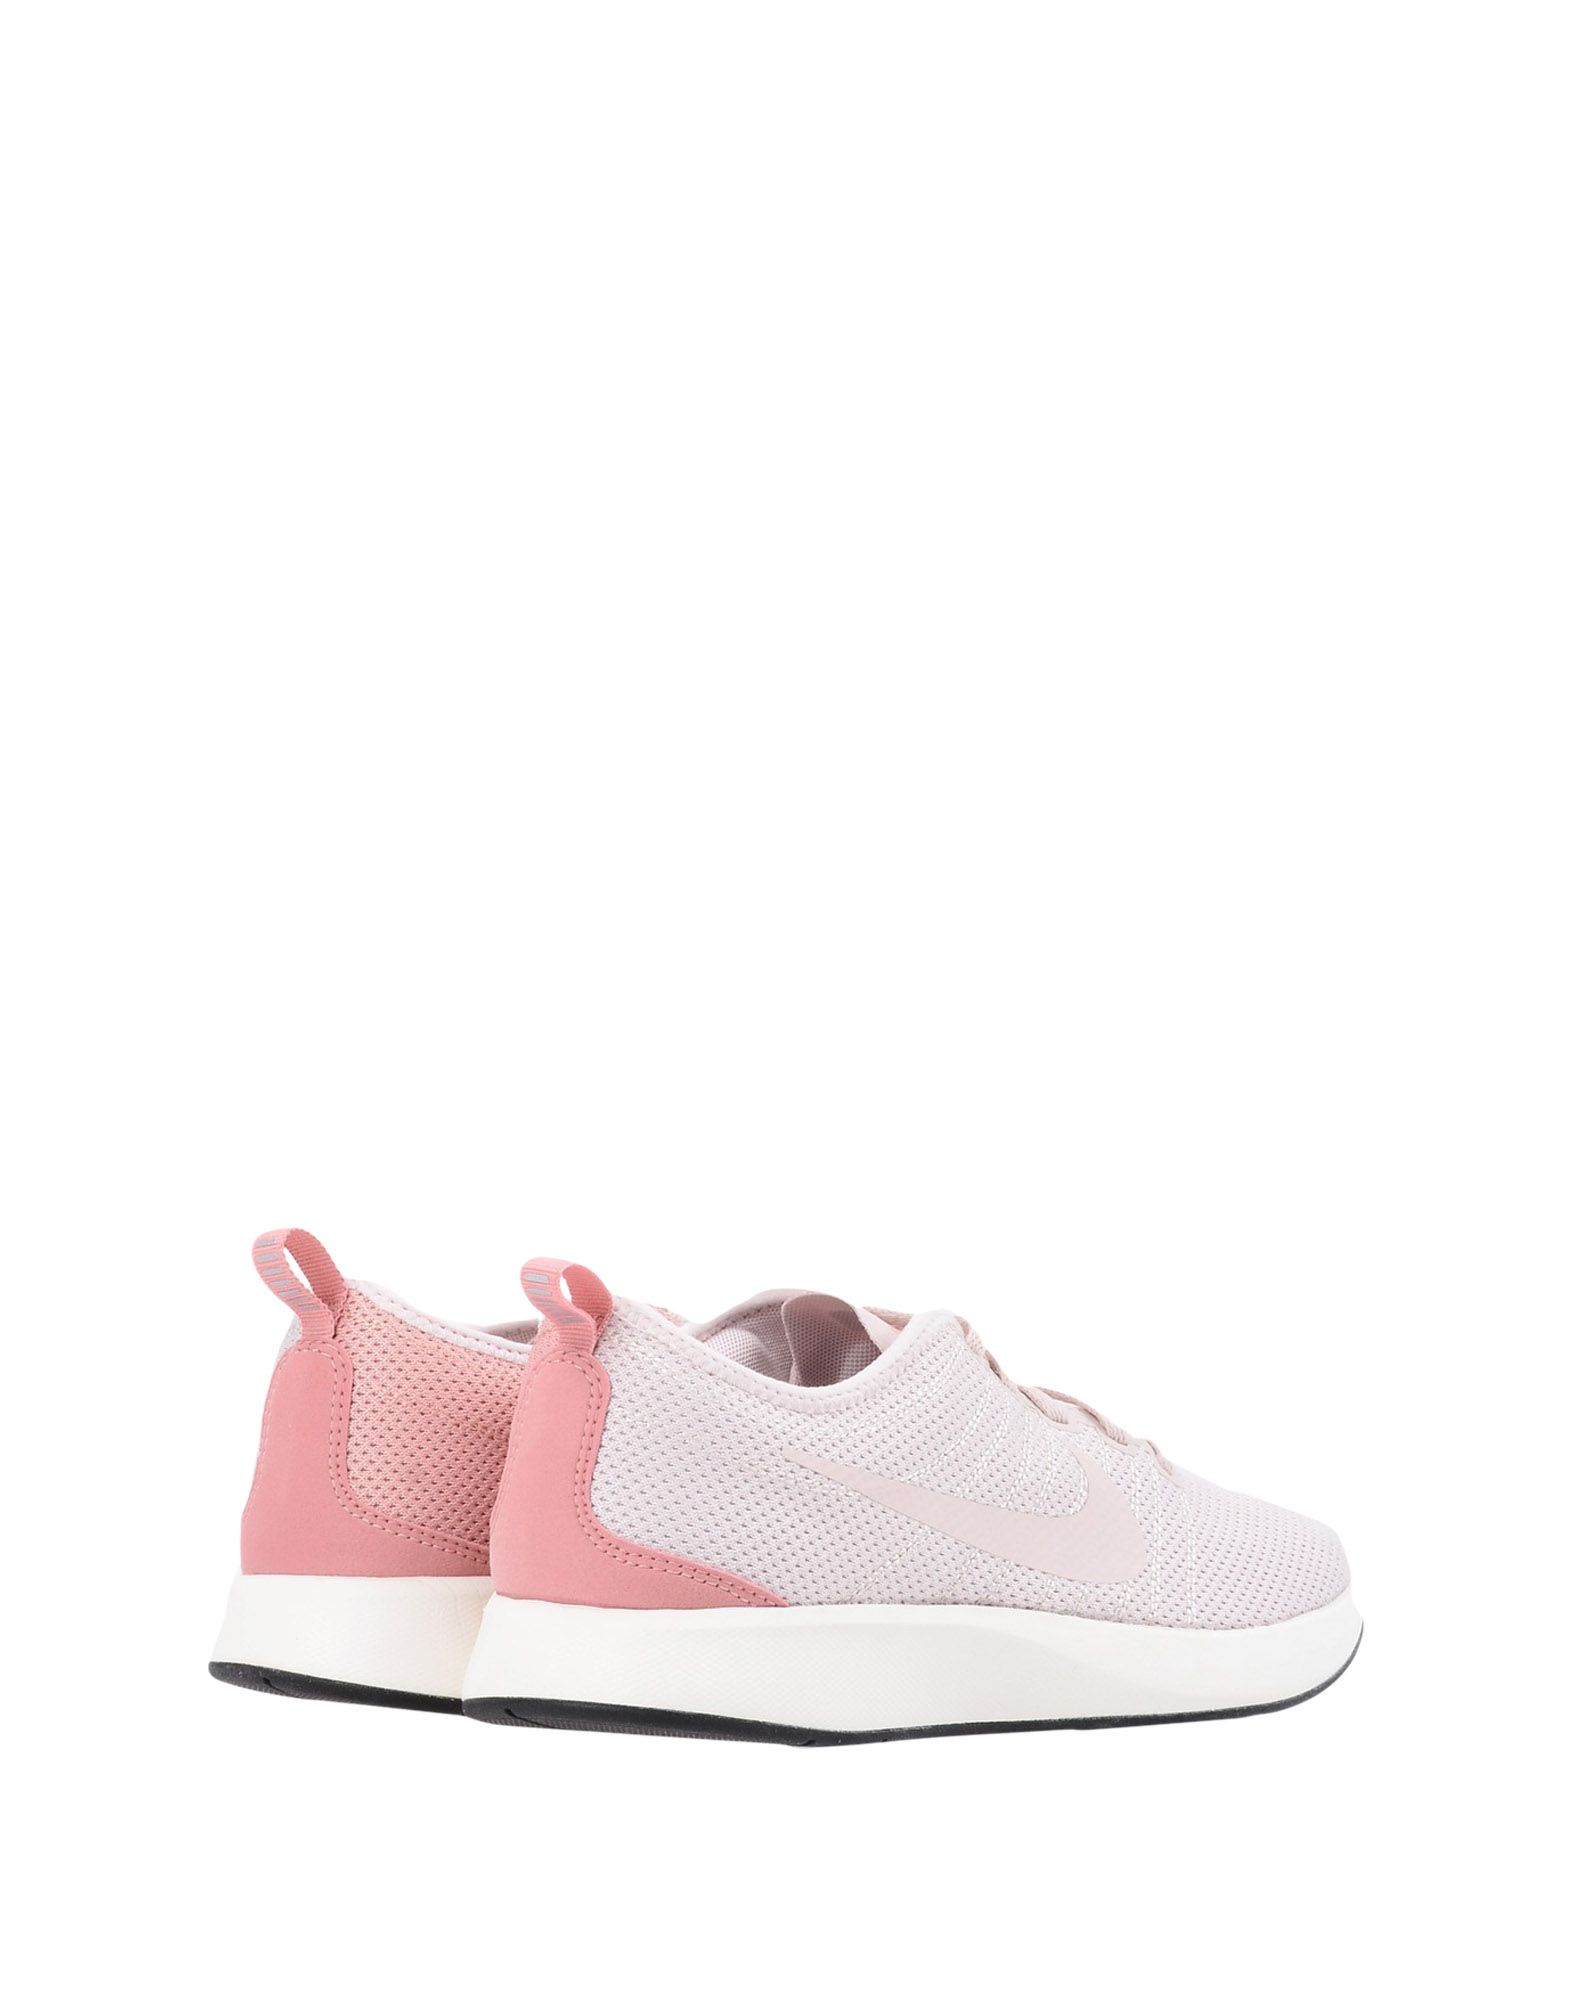 Nike    Dualtone Racer  11325688KT Gute Qualität beliebte Schuhe